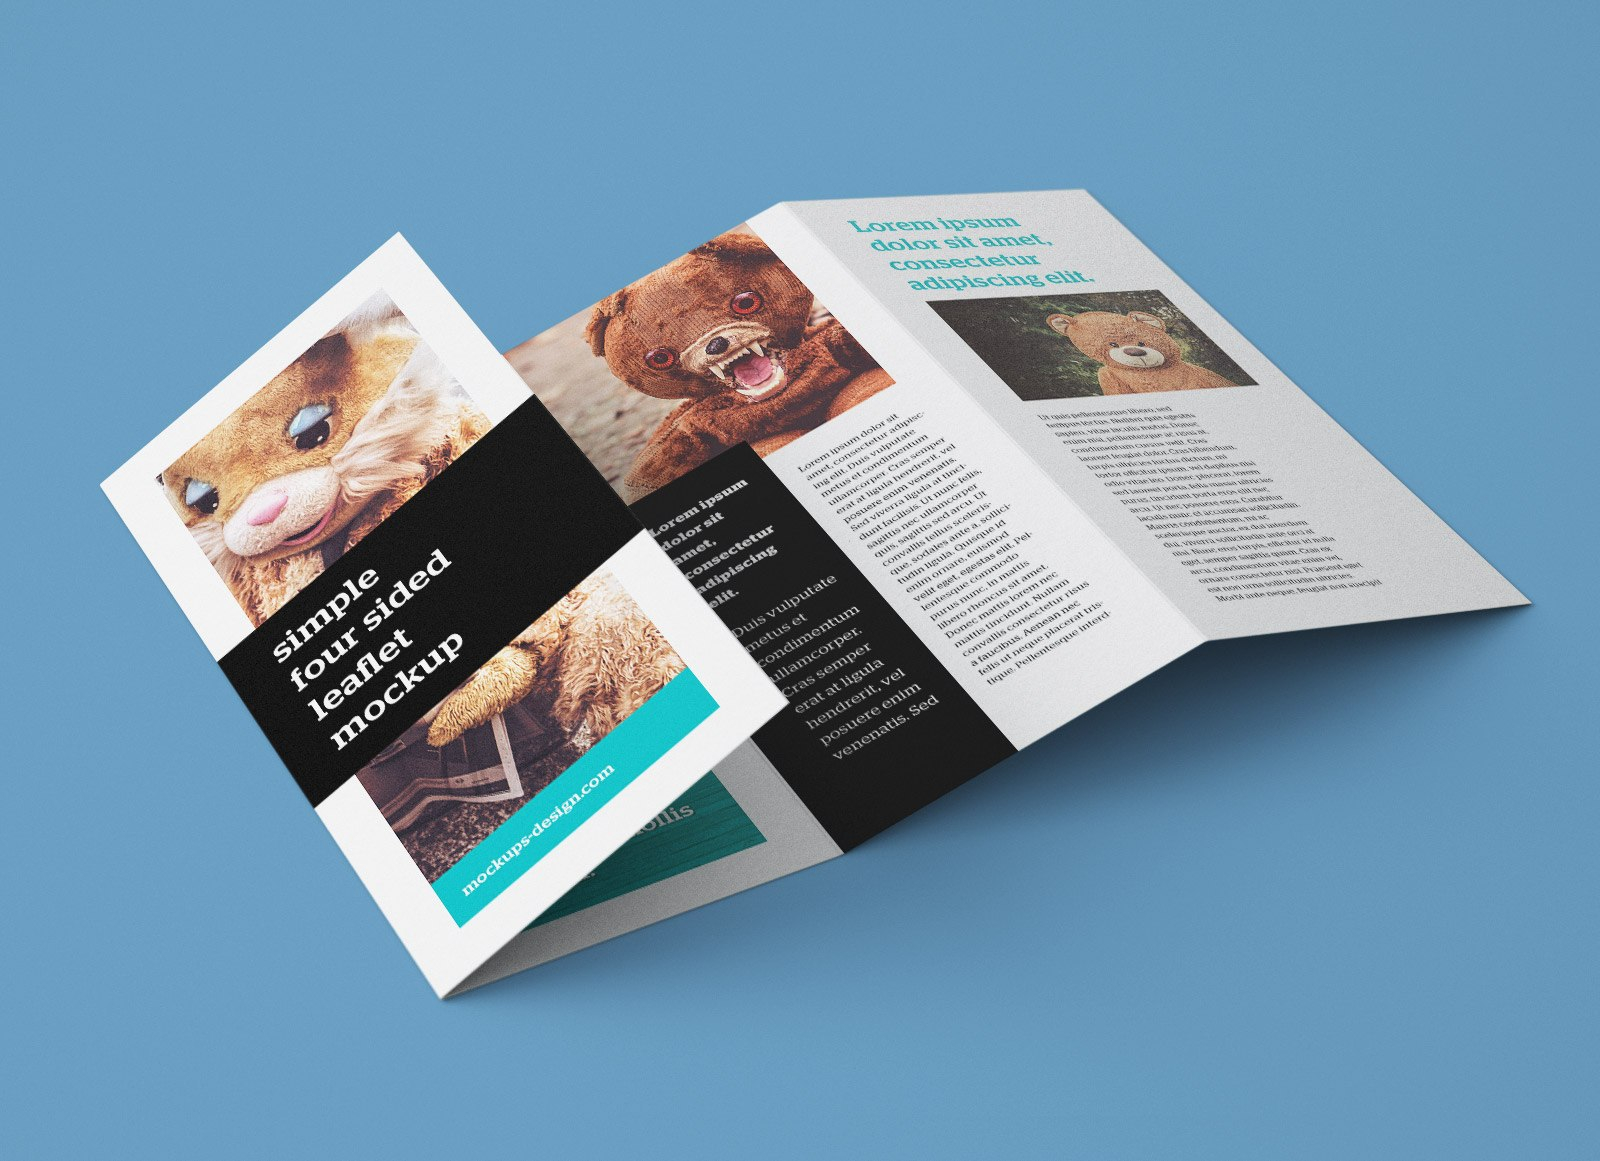 Free Accordion Fold Brochure  Leaflet Mockup Psd Templates  Good Within 2 Fold Brochure Template Psd